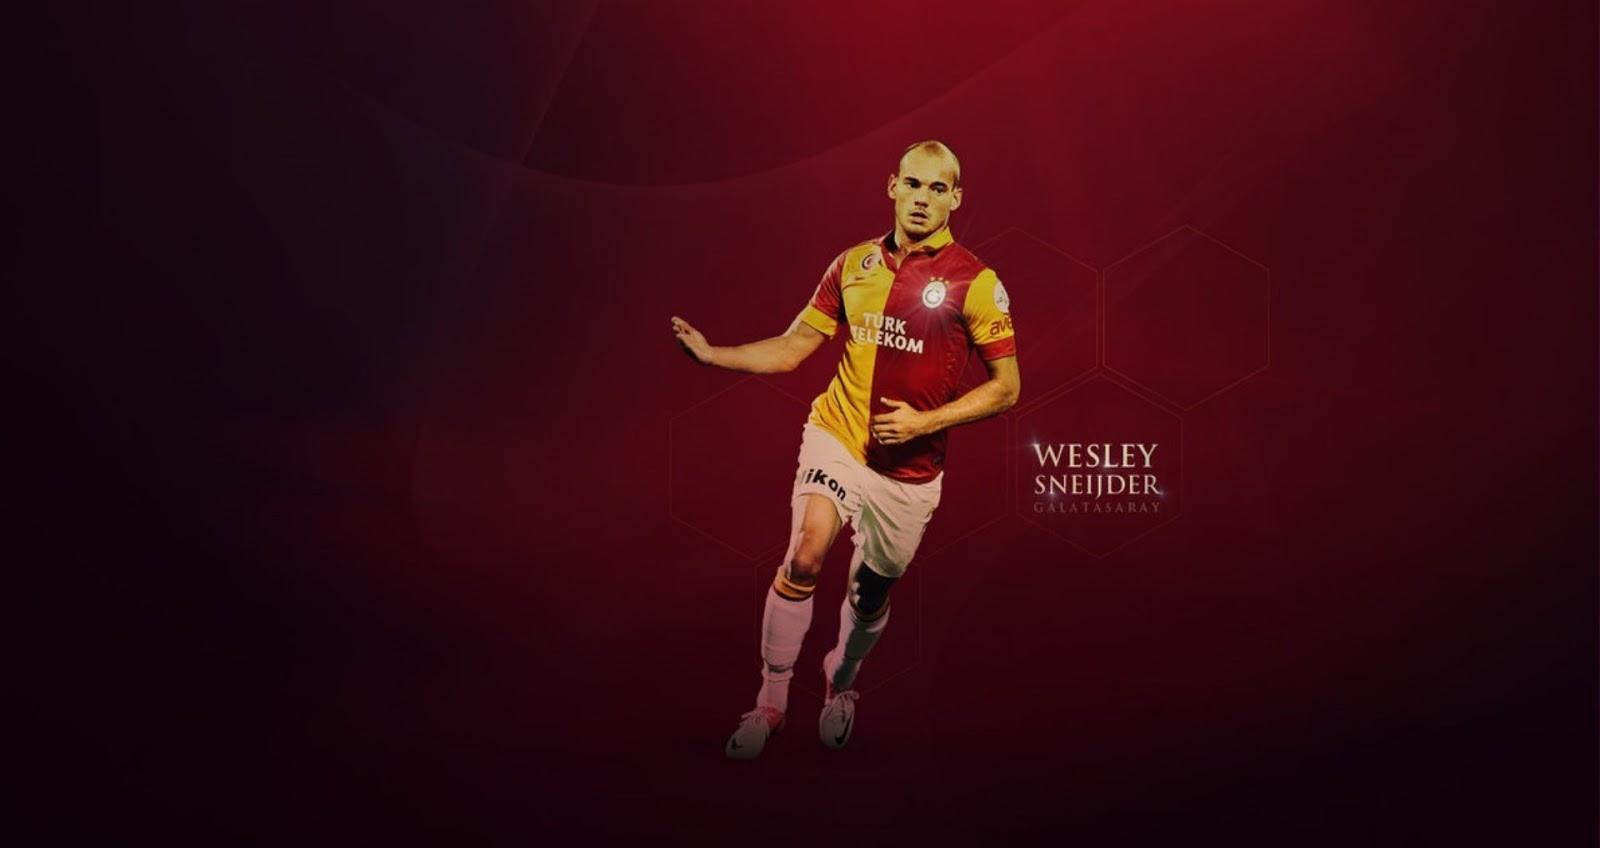 wesley+sneijder+galatasaray+resimleri+rooteto+1 Wesley Sneijder Galatasaray HD Resimleri